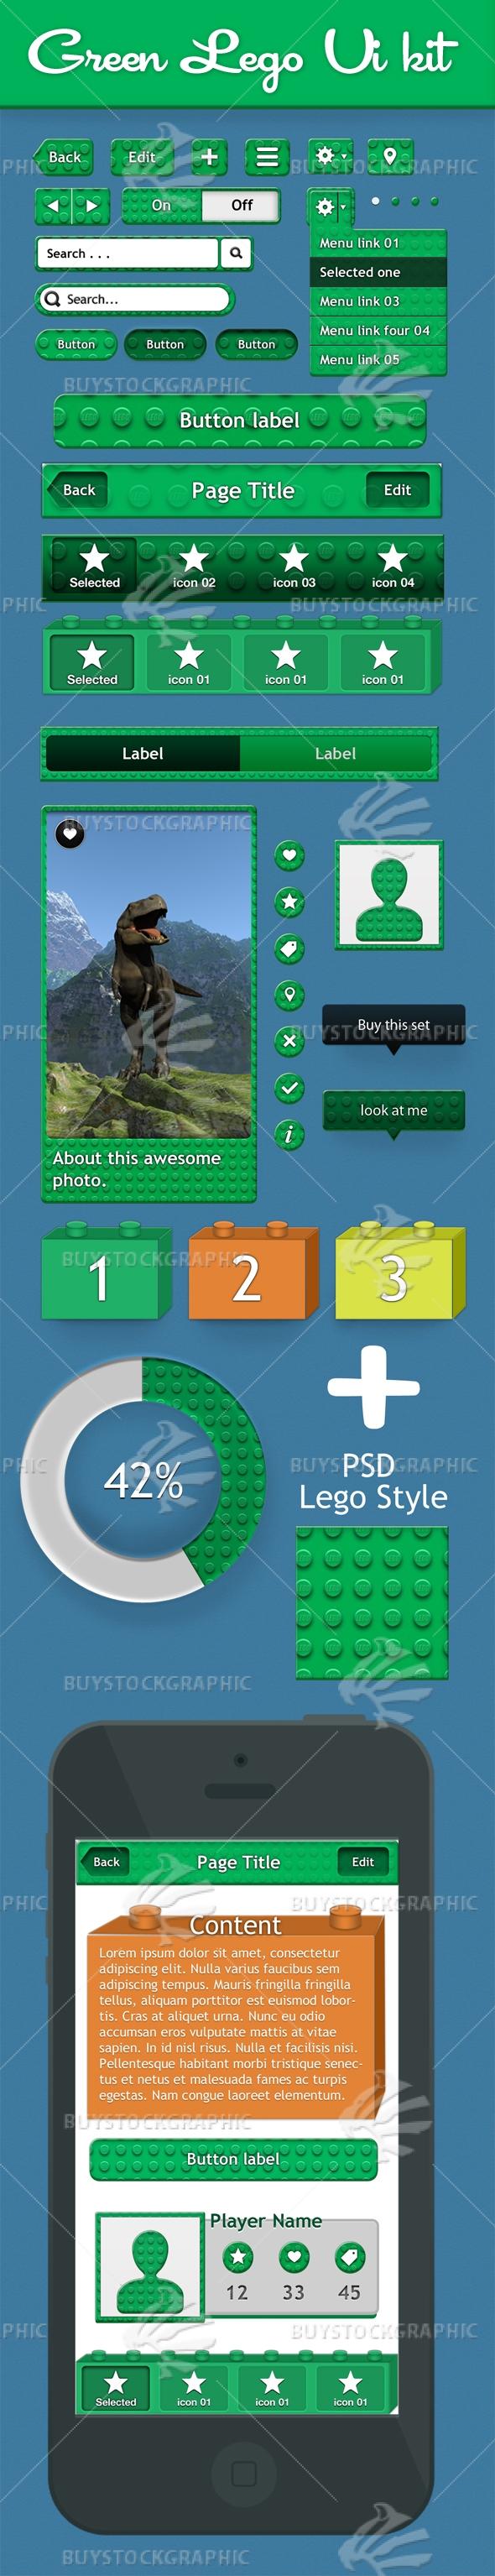 Green Ui kit lego style